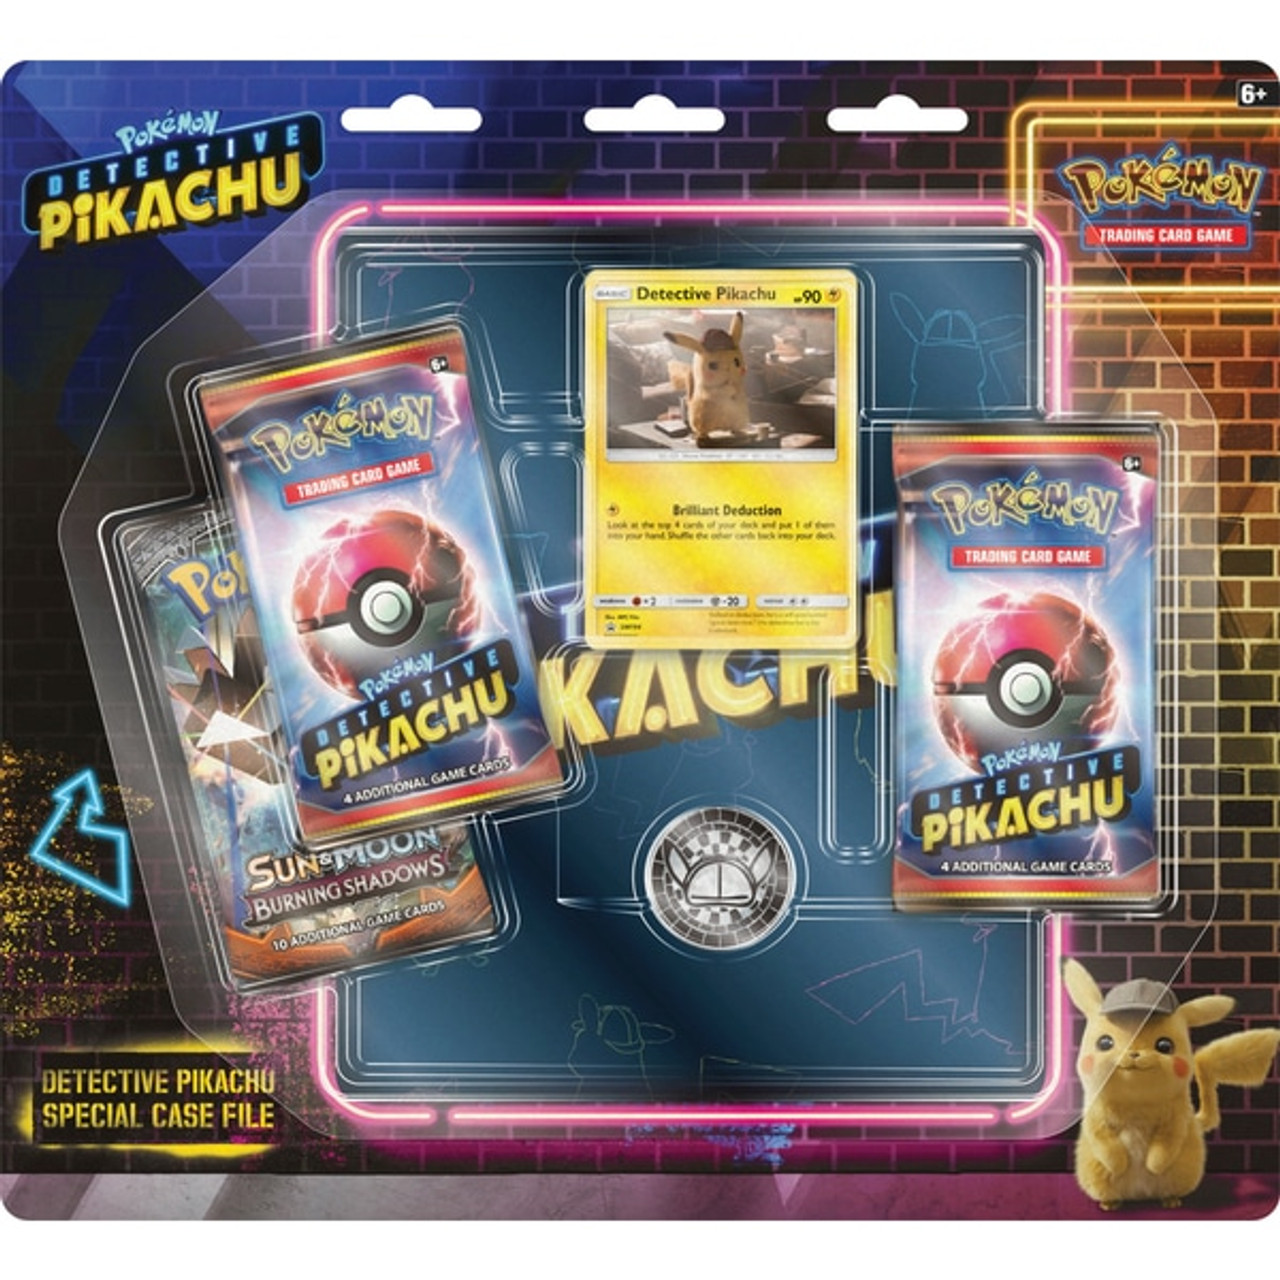 Pokemon Detective Pikachu Special Case File Game Nerdz